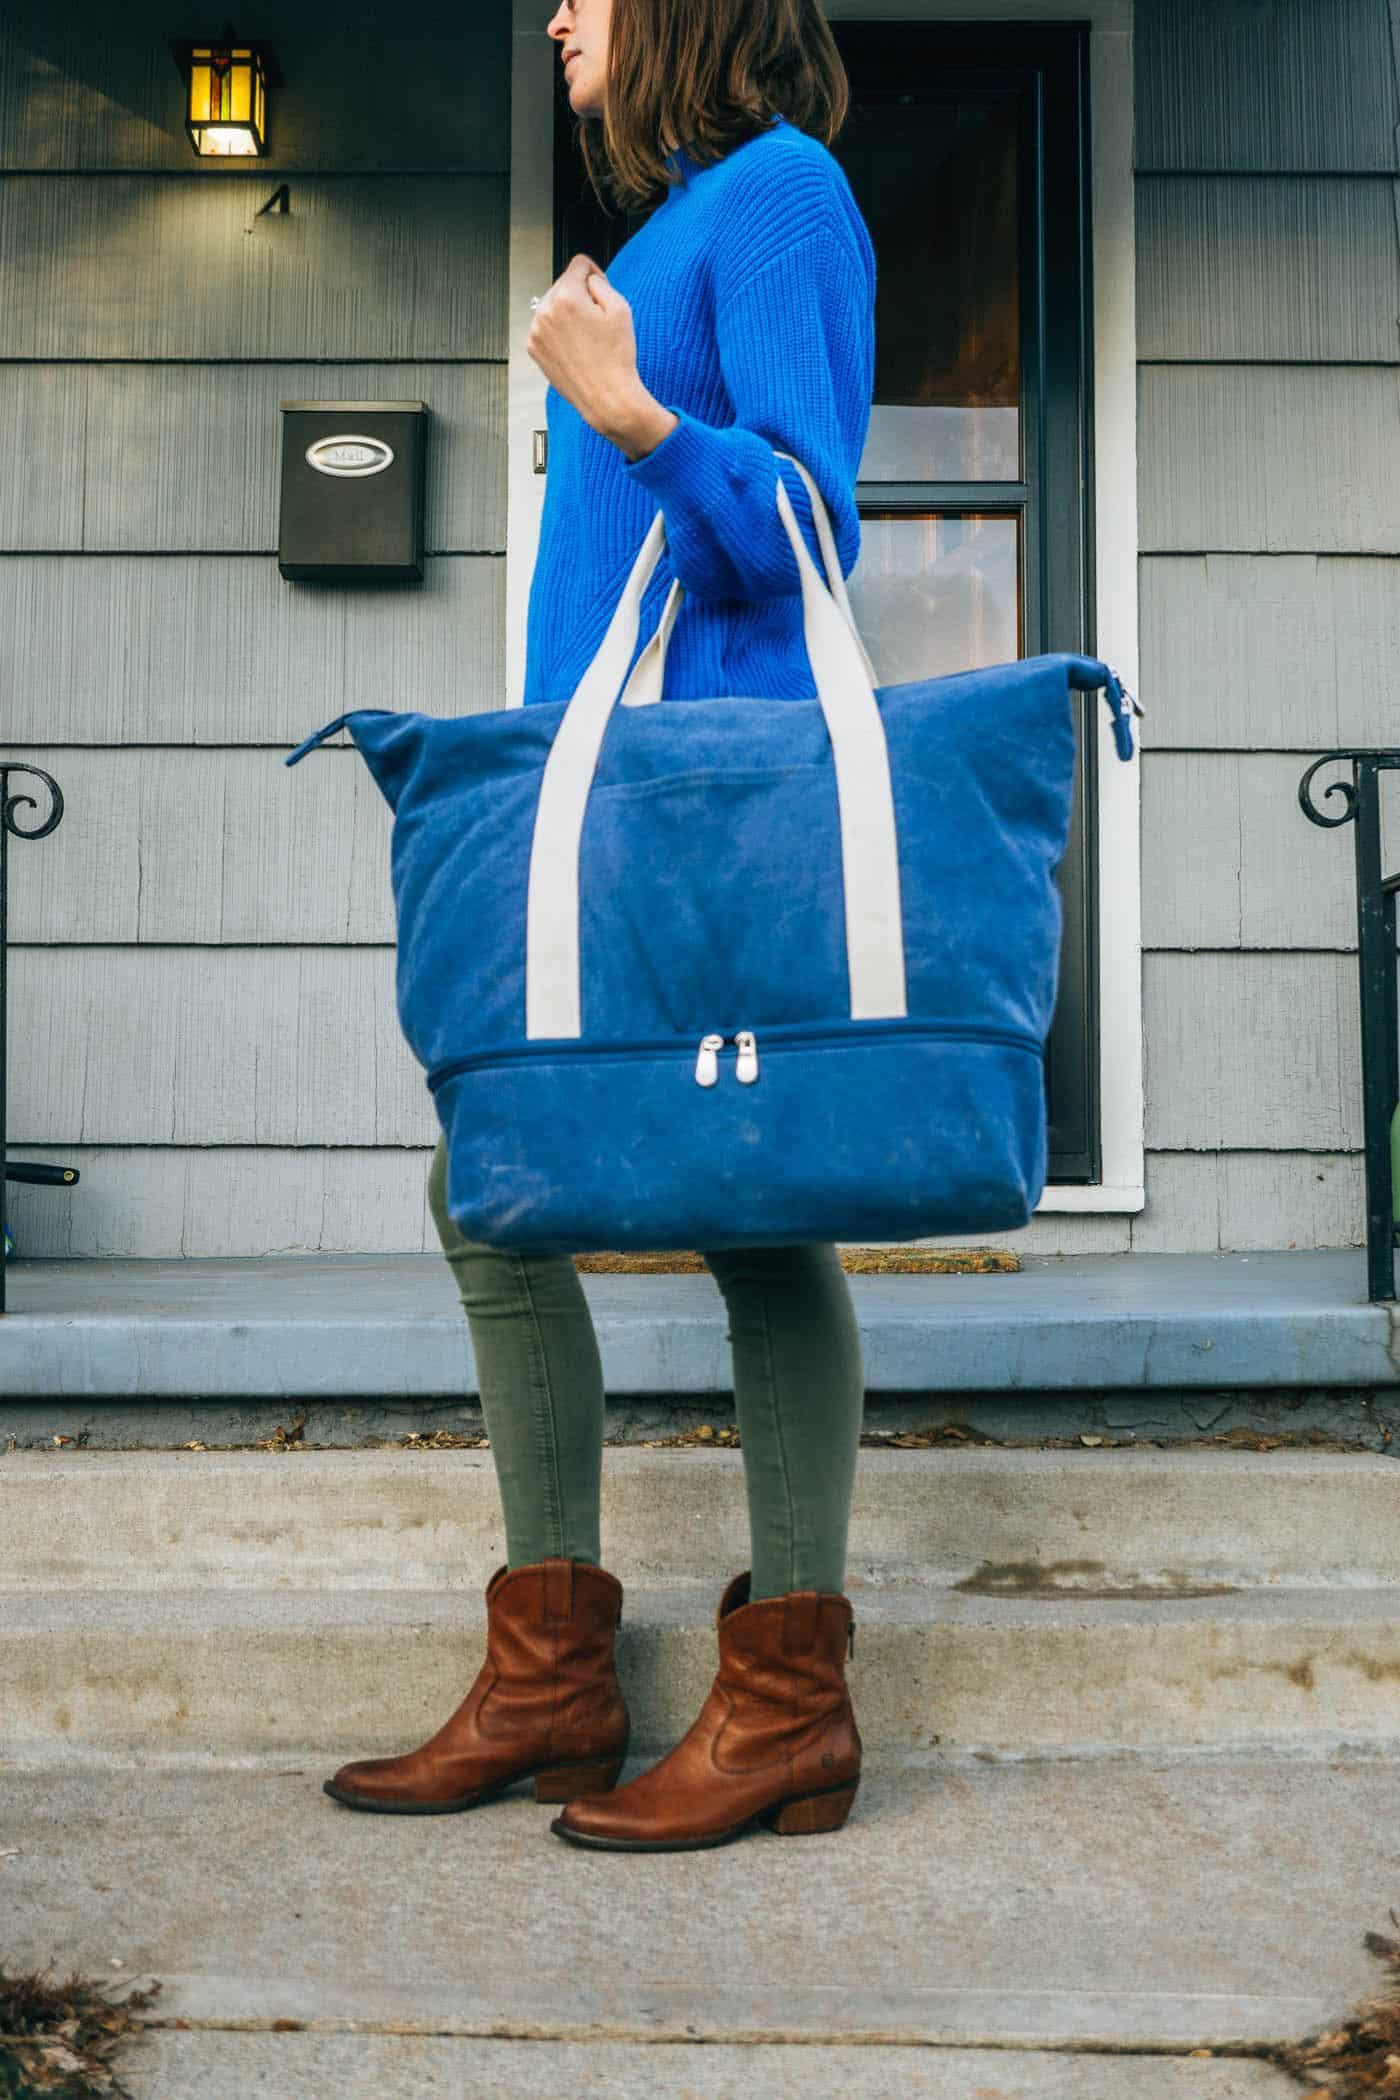 Lo & Sons Catalina Weekender Bag